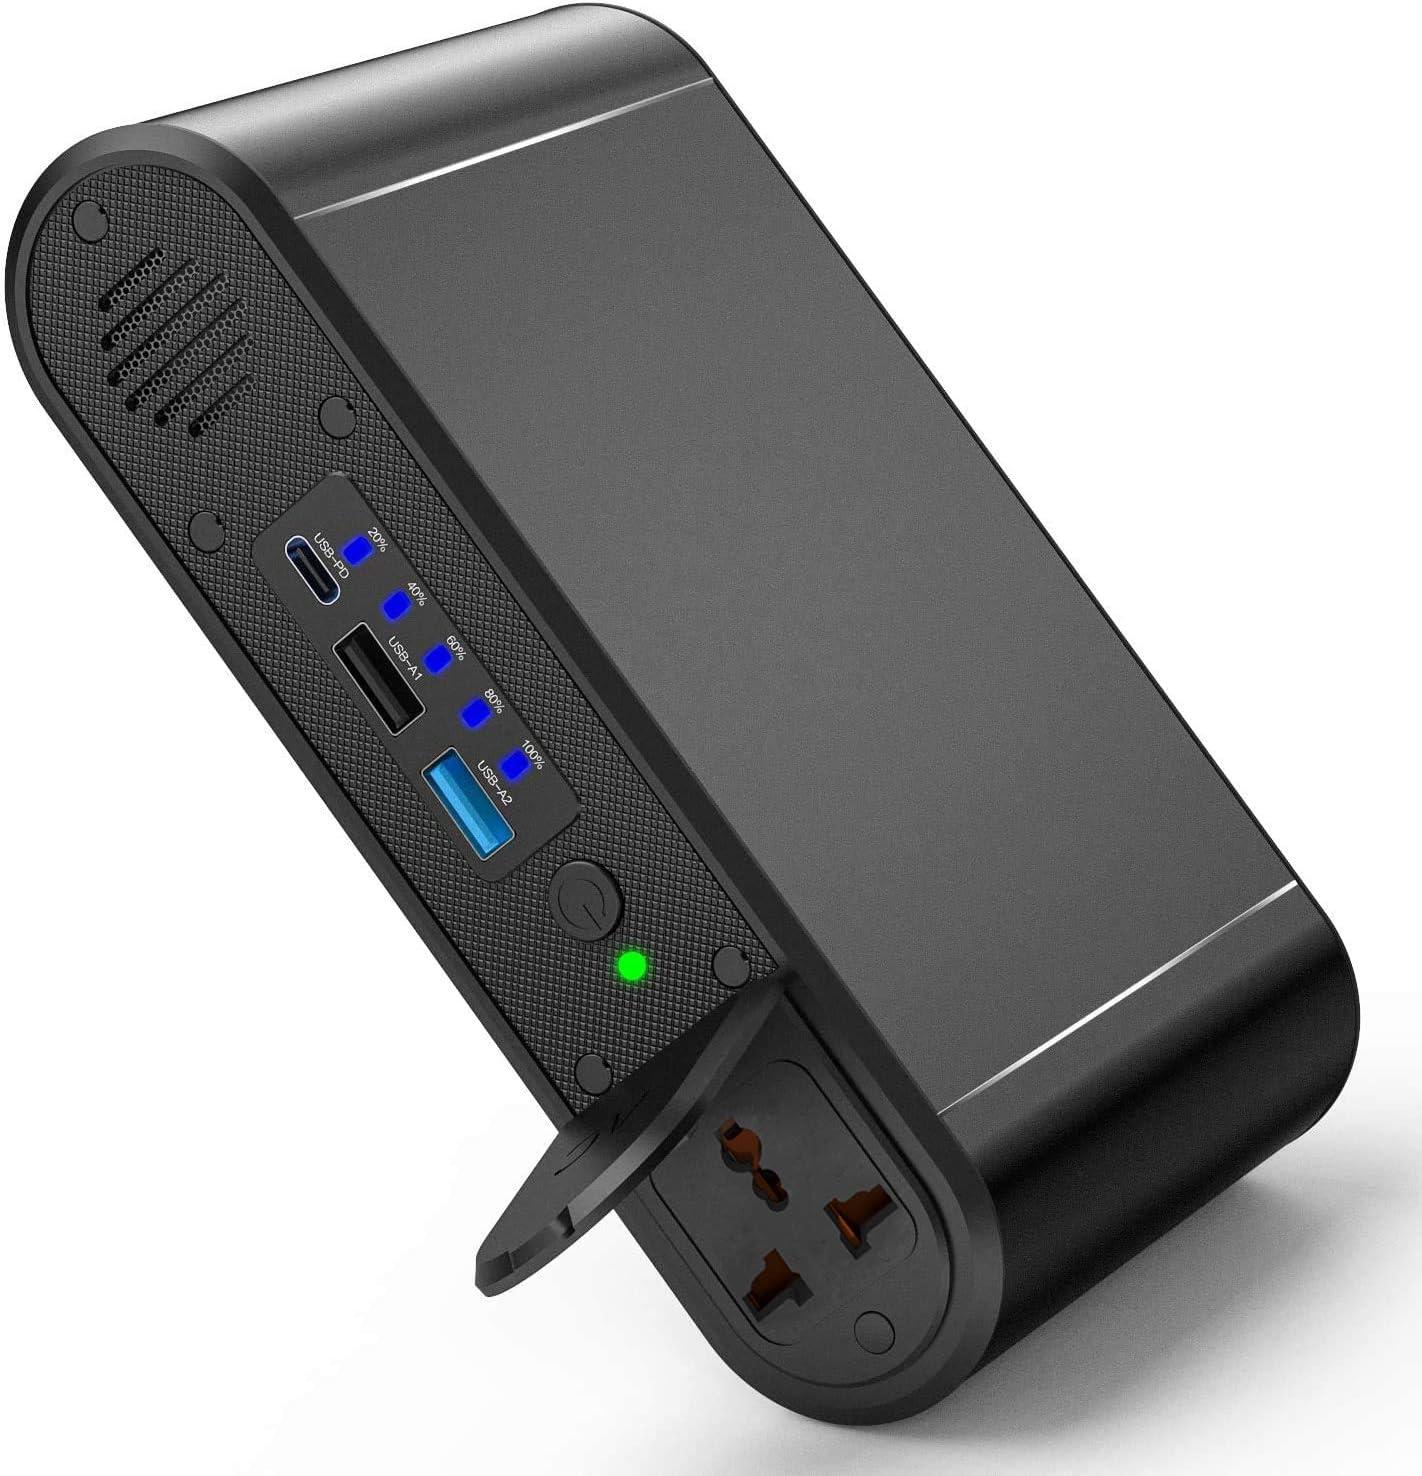 Powerstation, PD 45 W Powerbank 30000 mAh batería externa 120 W Cargador portátil con puerto USB Universal Powerstation Cargador de viaje para ...